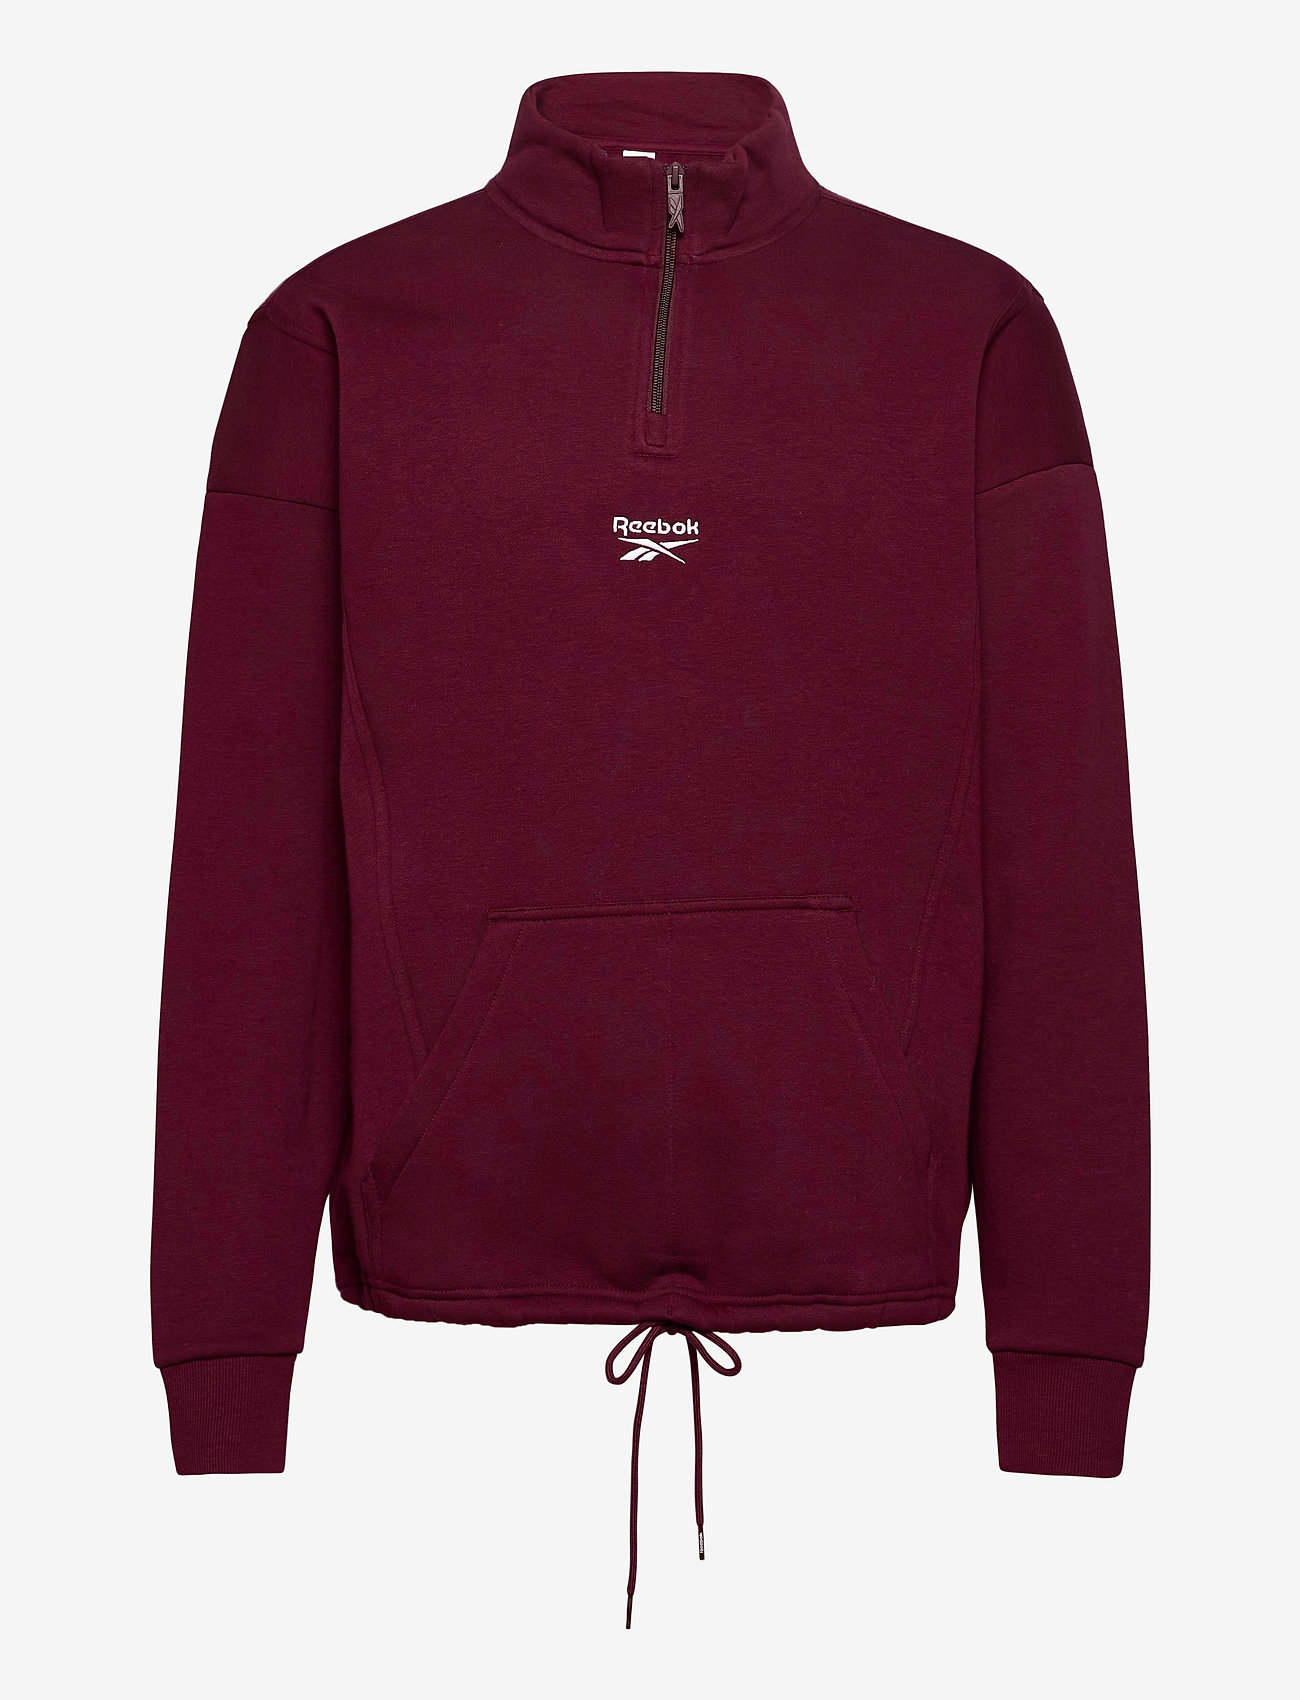 Reebok Classics - CL F HALFZIP SWEATER - basic-sweatshirts - maroon - 1